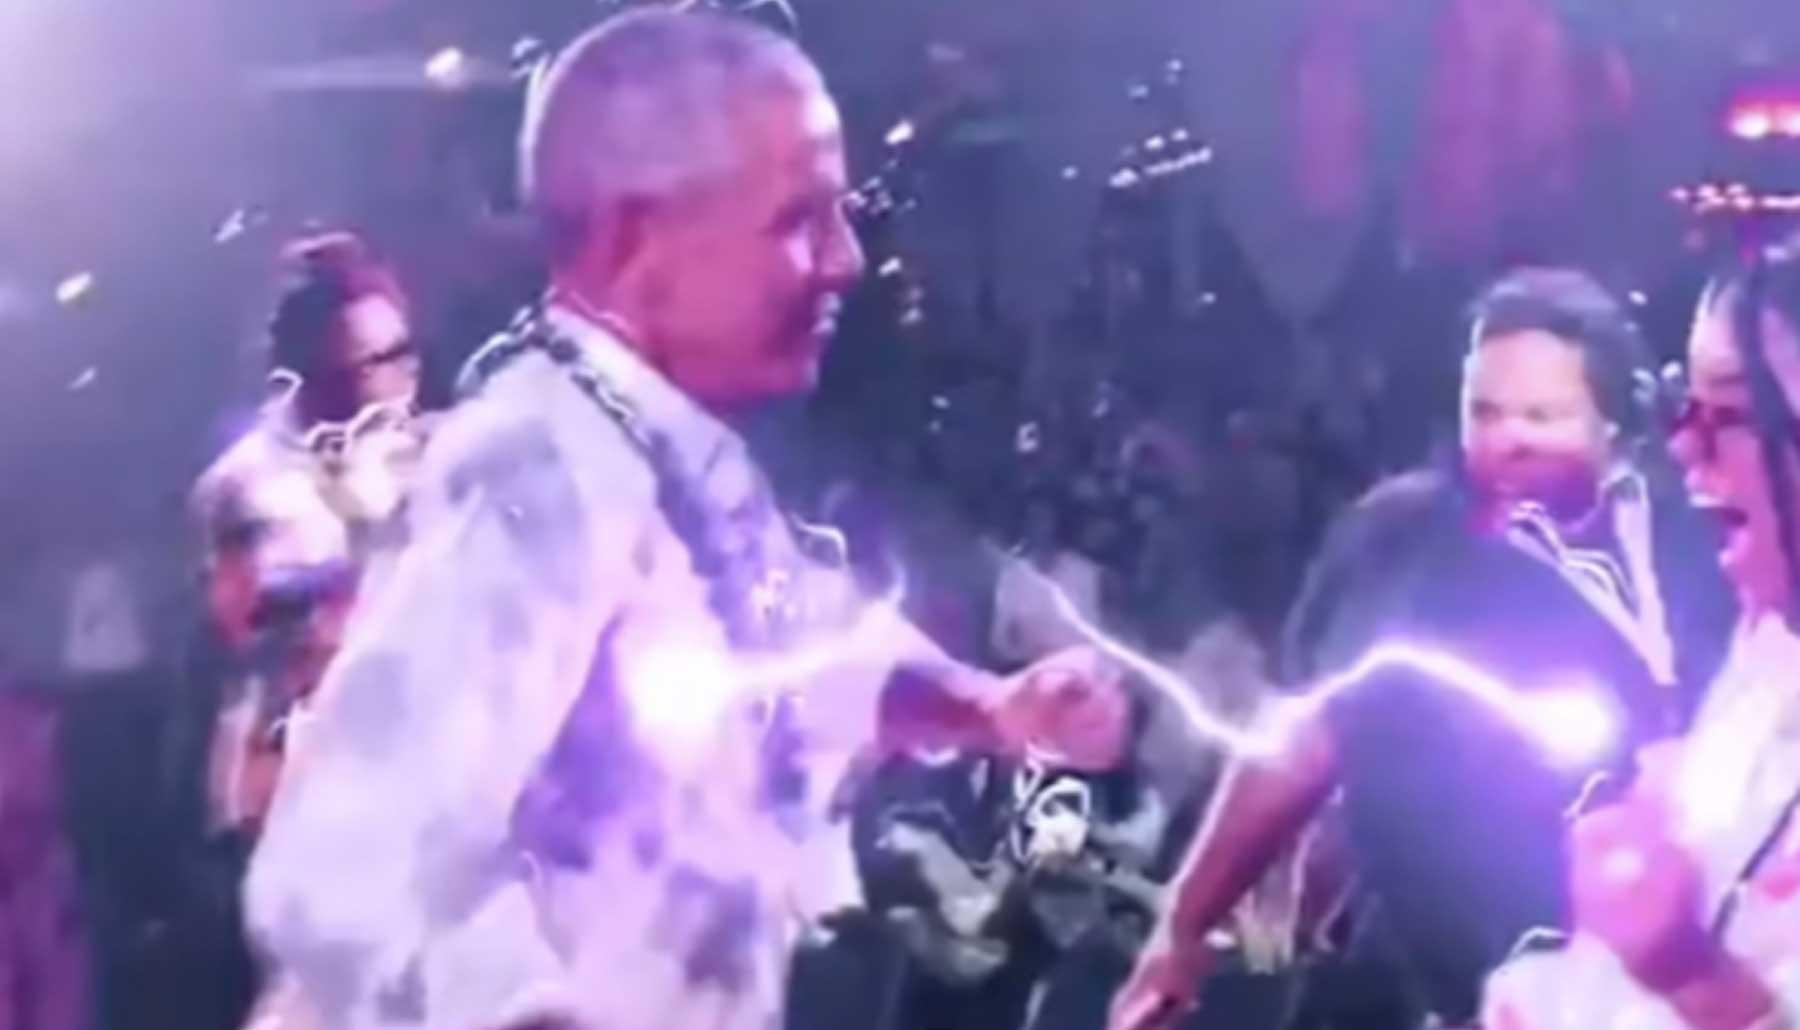 Barack Obama celebra su cumpleaños 60 a lo grande